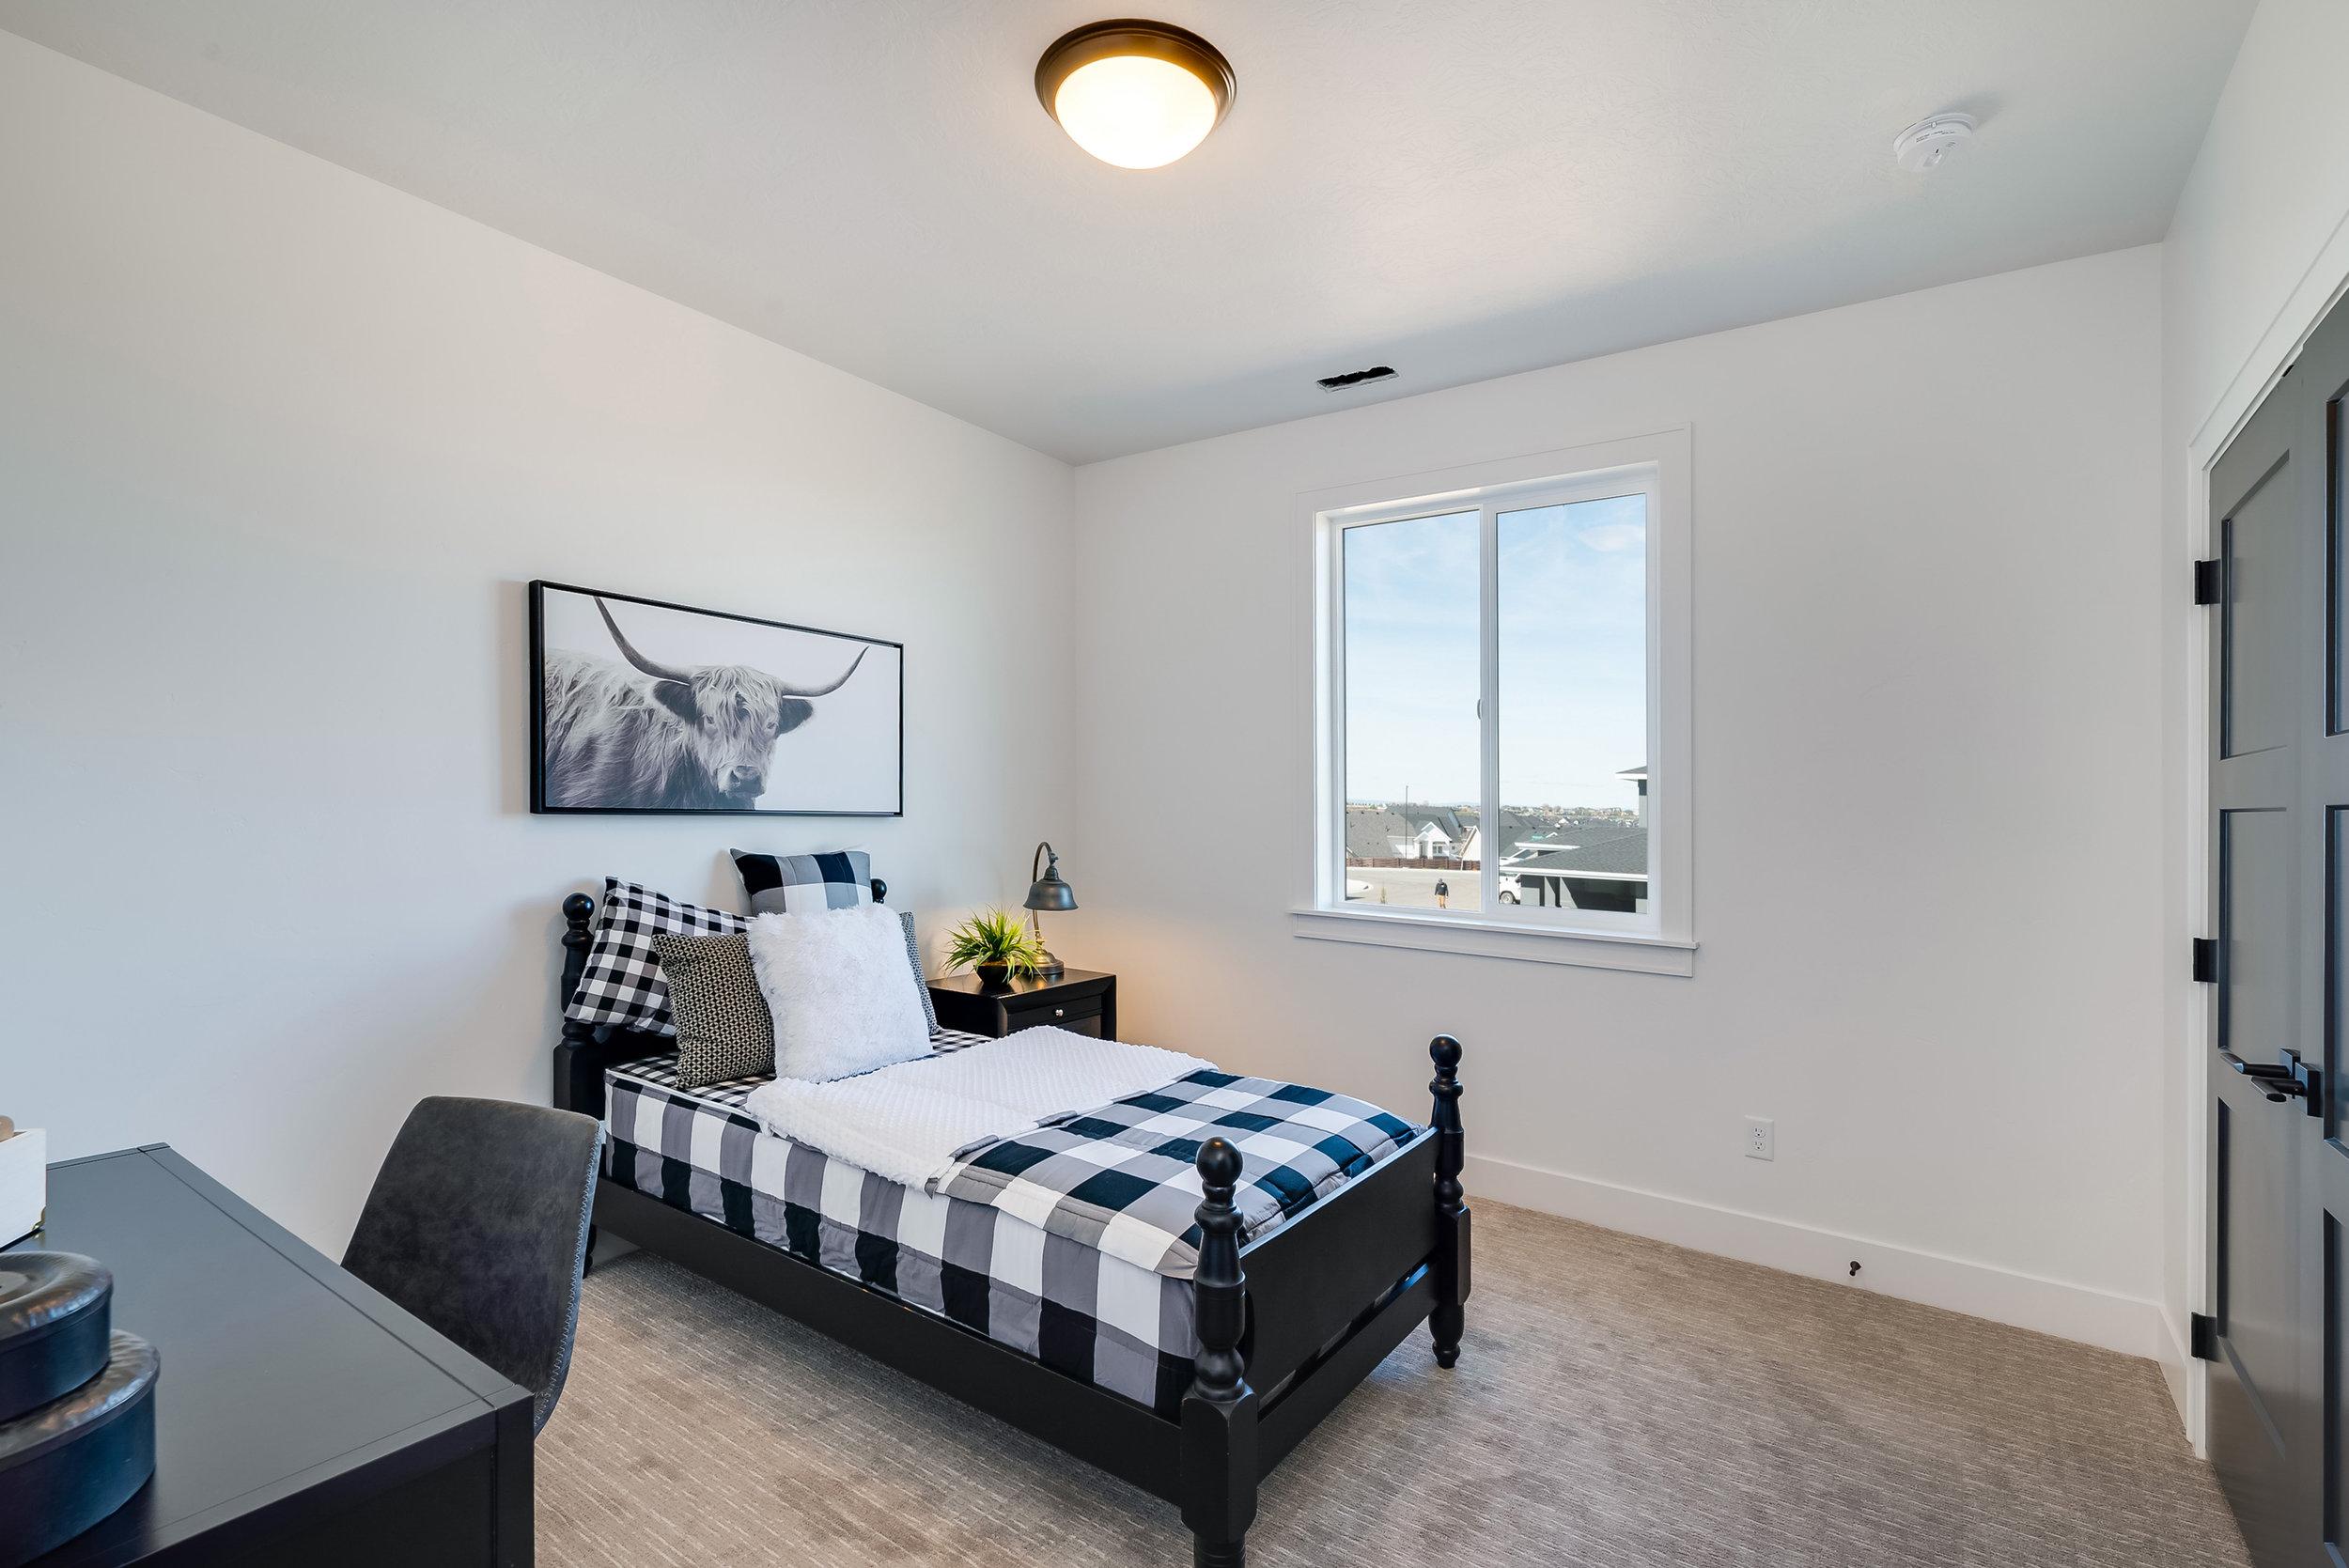 45-Bedroom.jpg